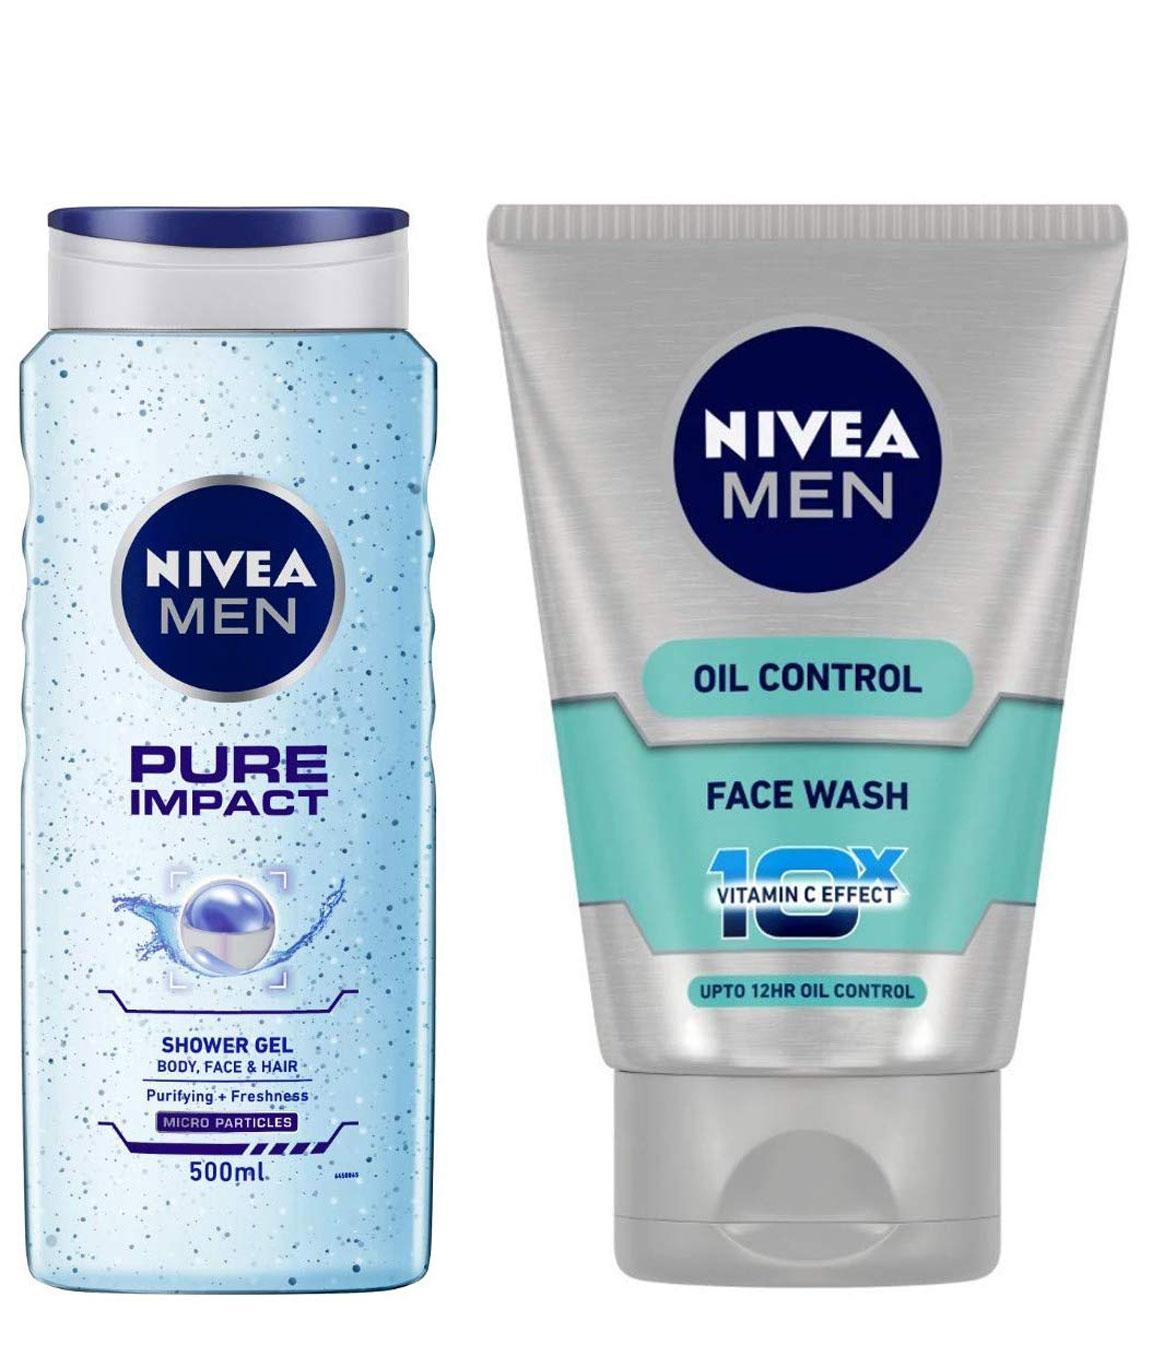 NIVEA MEN Hair, Face & Body Wash, Pure Impact Shower Gel, 500ml & MEN Face Wash, Oil Control With Vitamin C, 100ml Combo